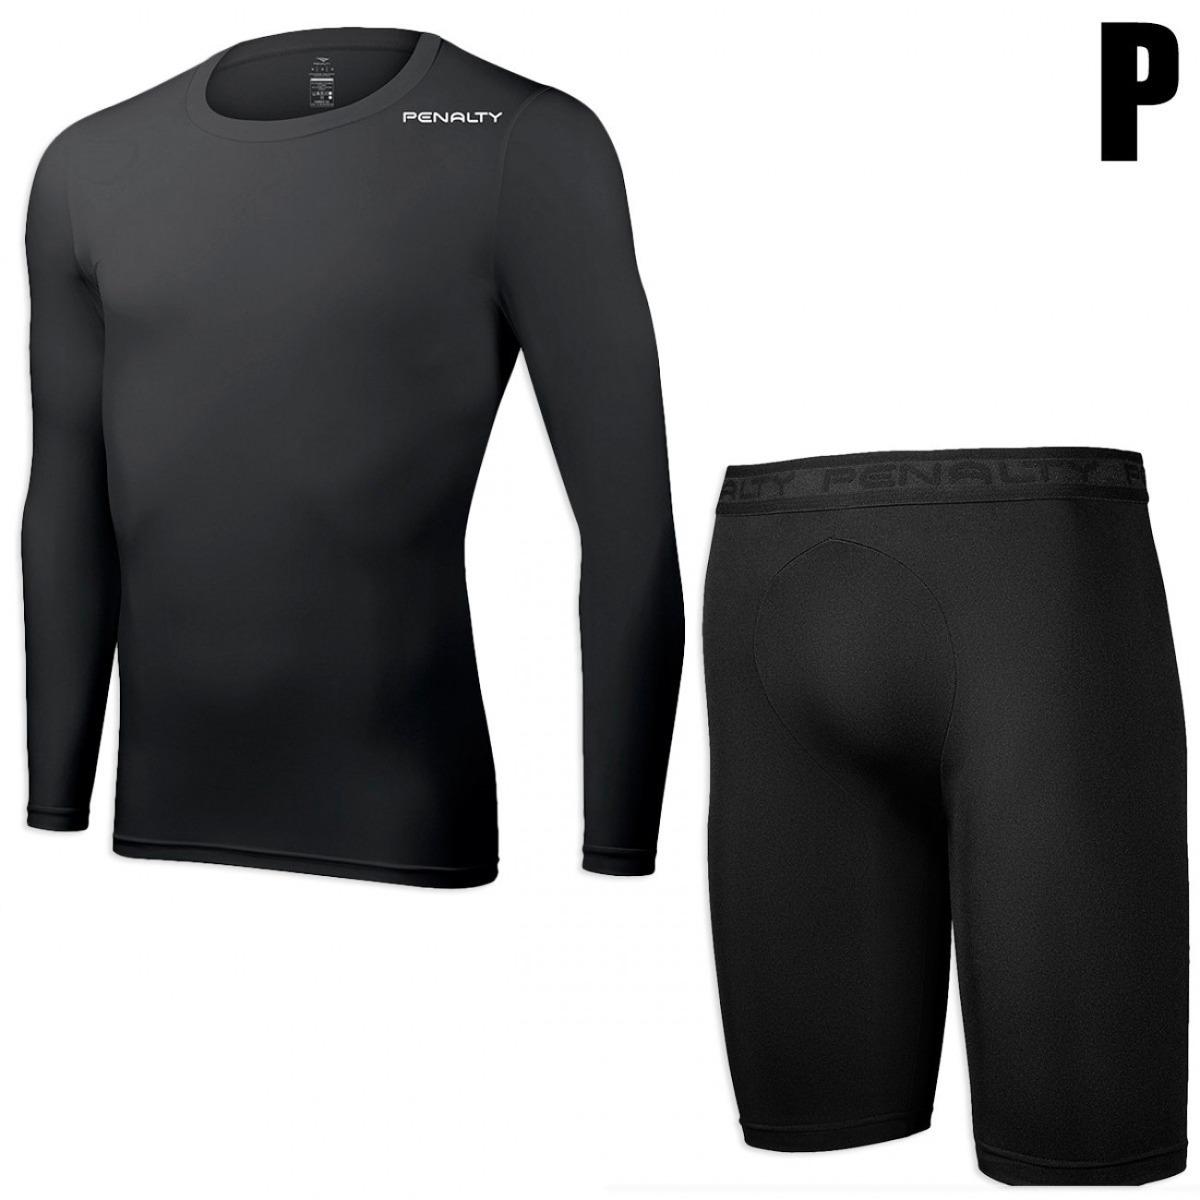 84f6aefb71 Kit Bermuda Térmica + Camiseta Manga Longa Tam P Penalty - R  114